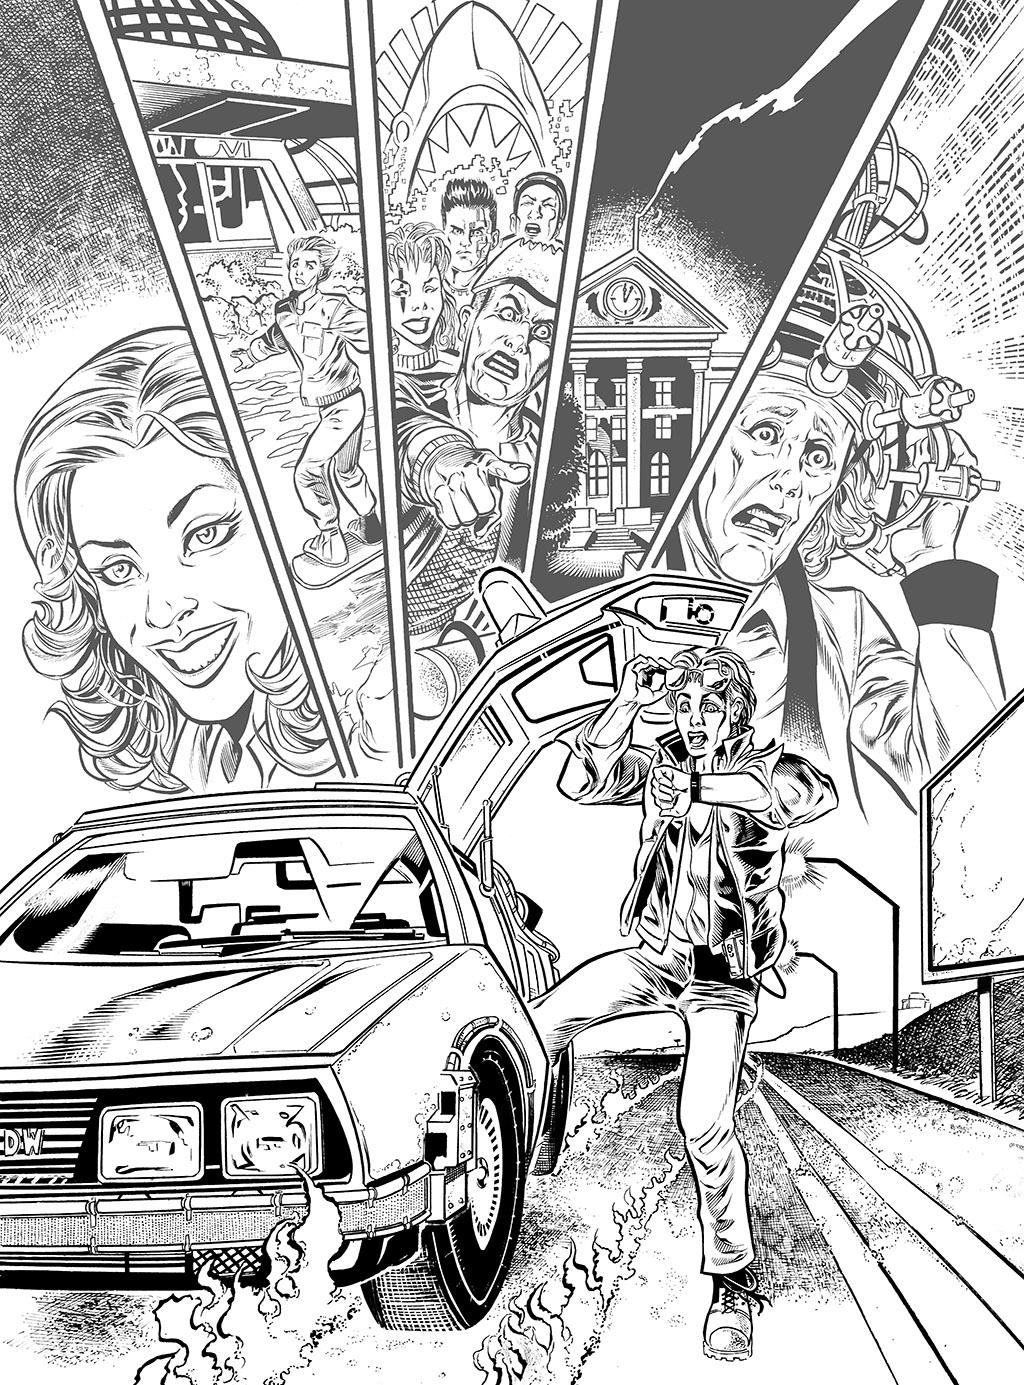 Back to the future SAMPLE INKS by RogerBonetMartinez on DeviantArt